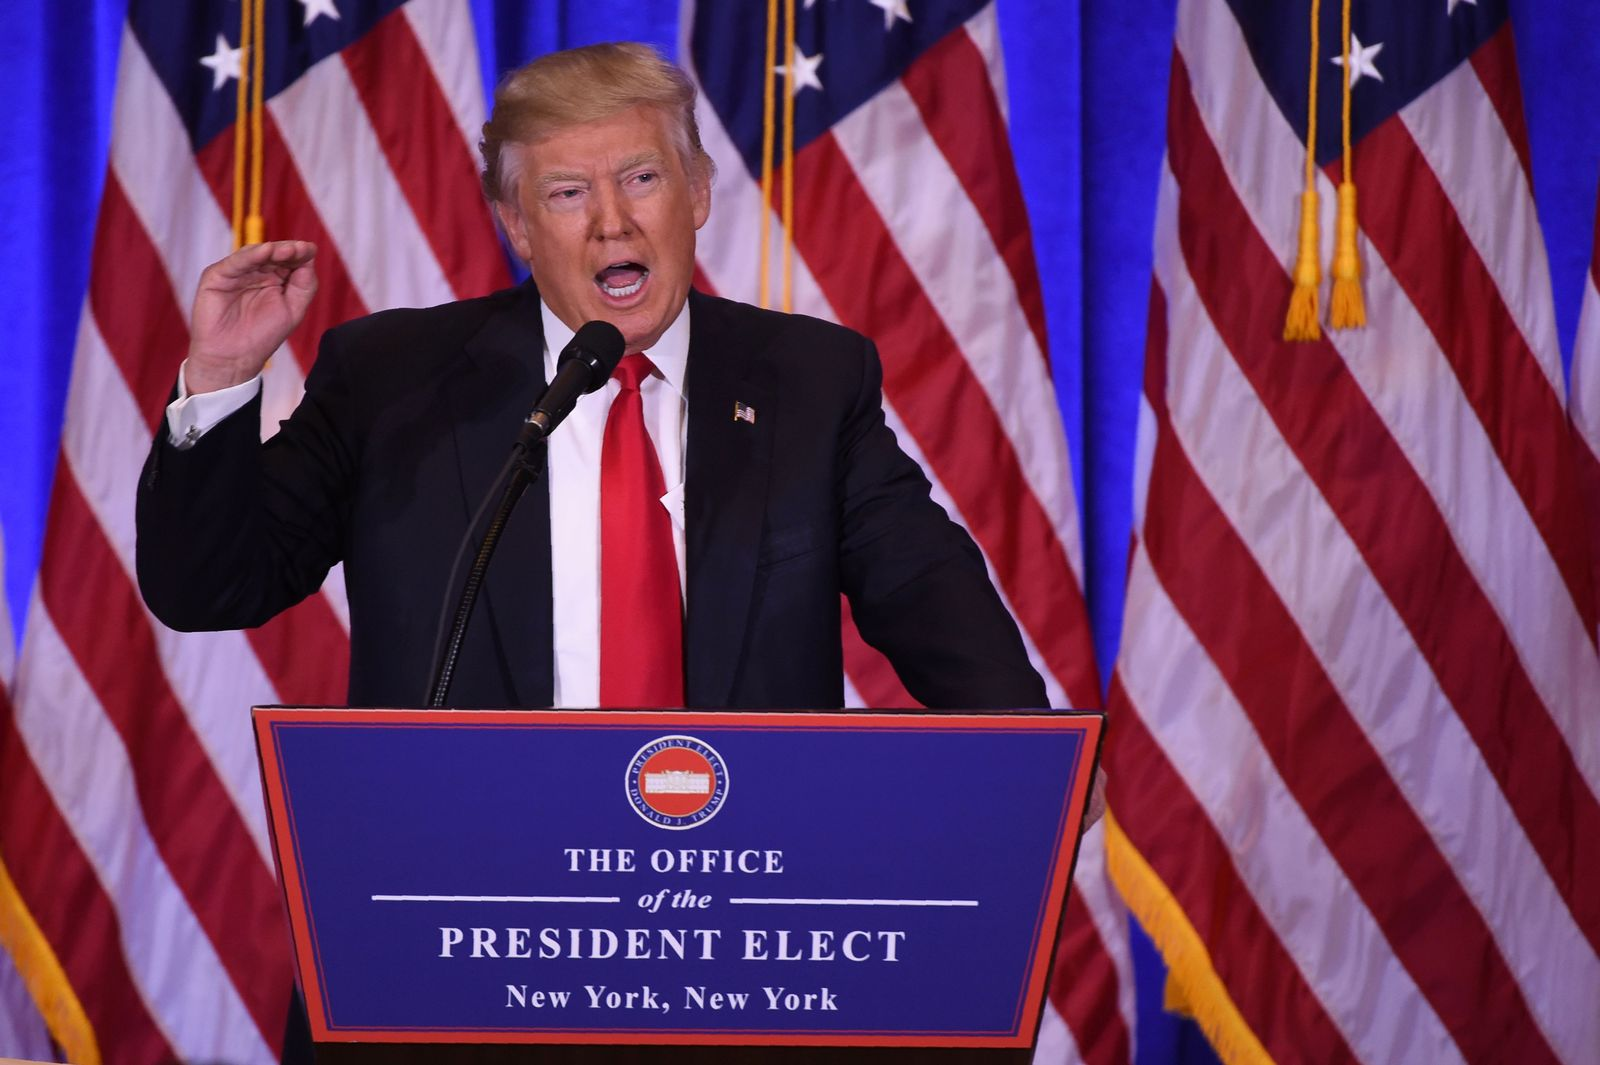 Donald Trump/ Erste PK